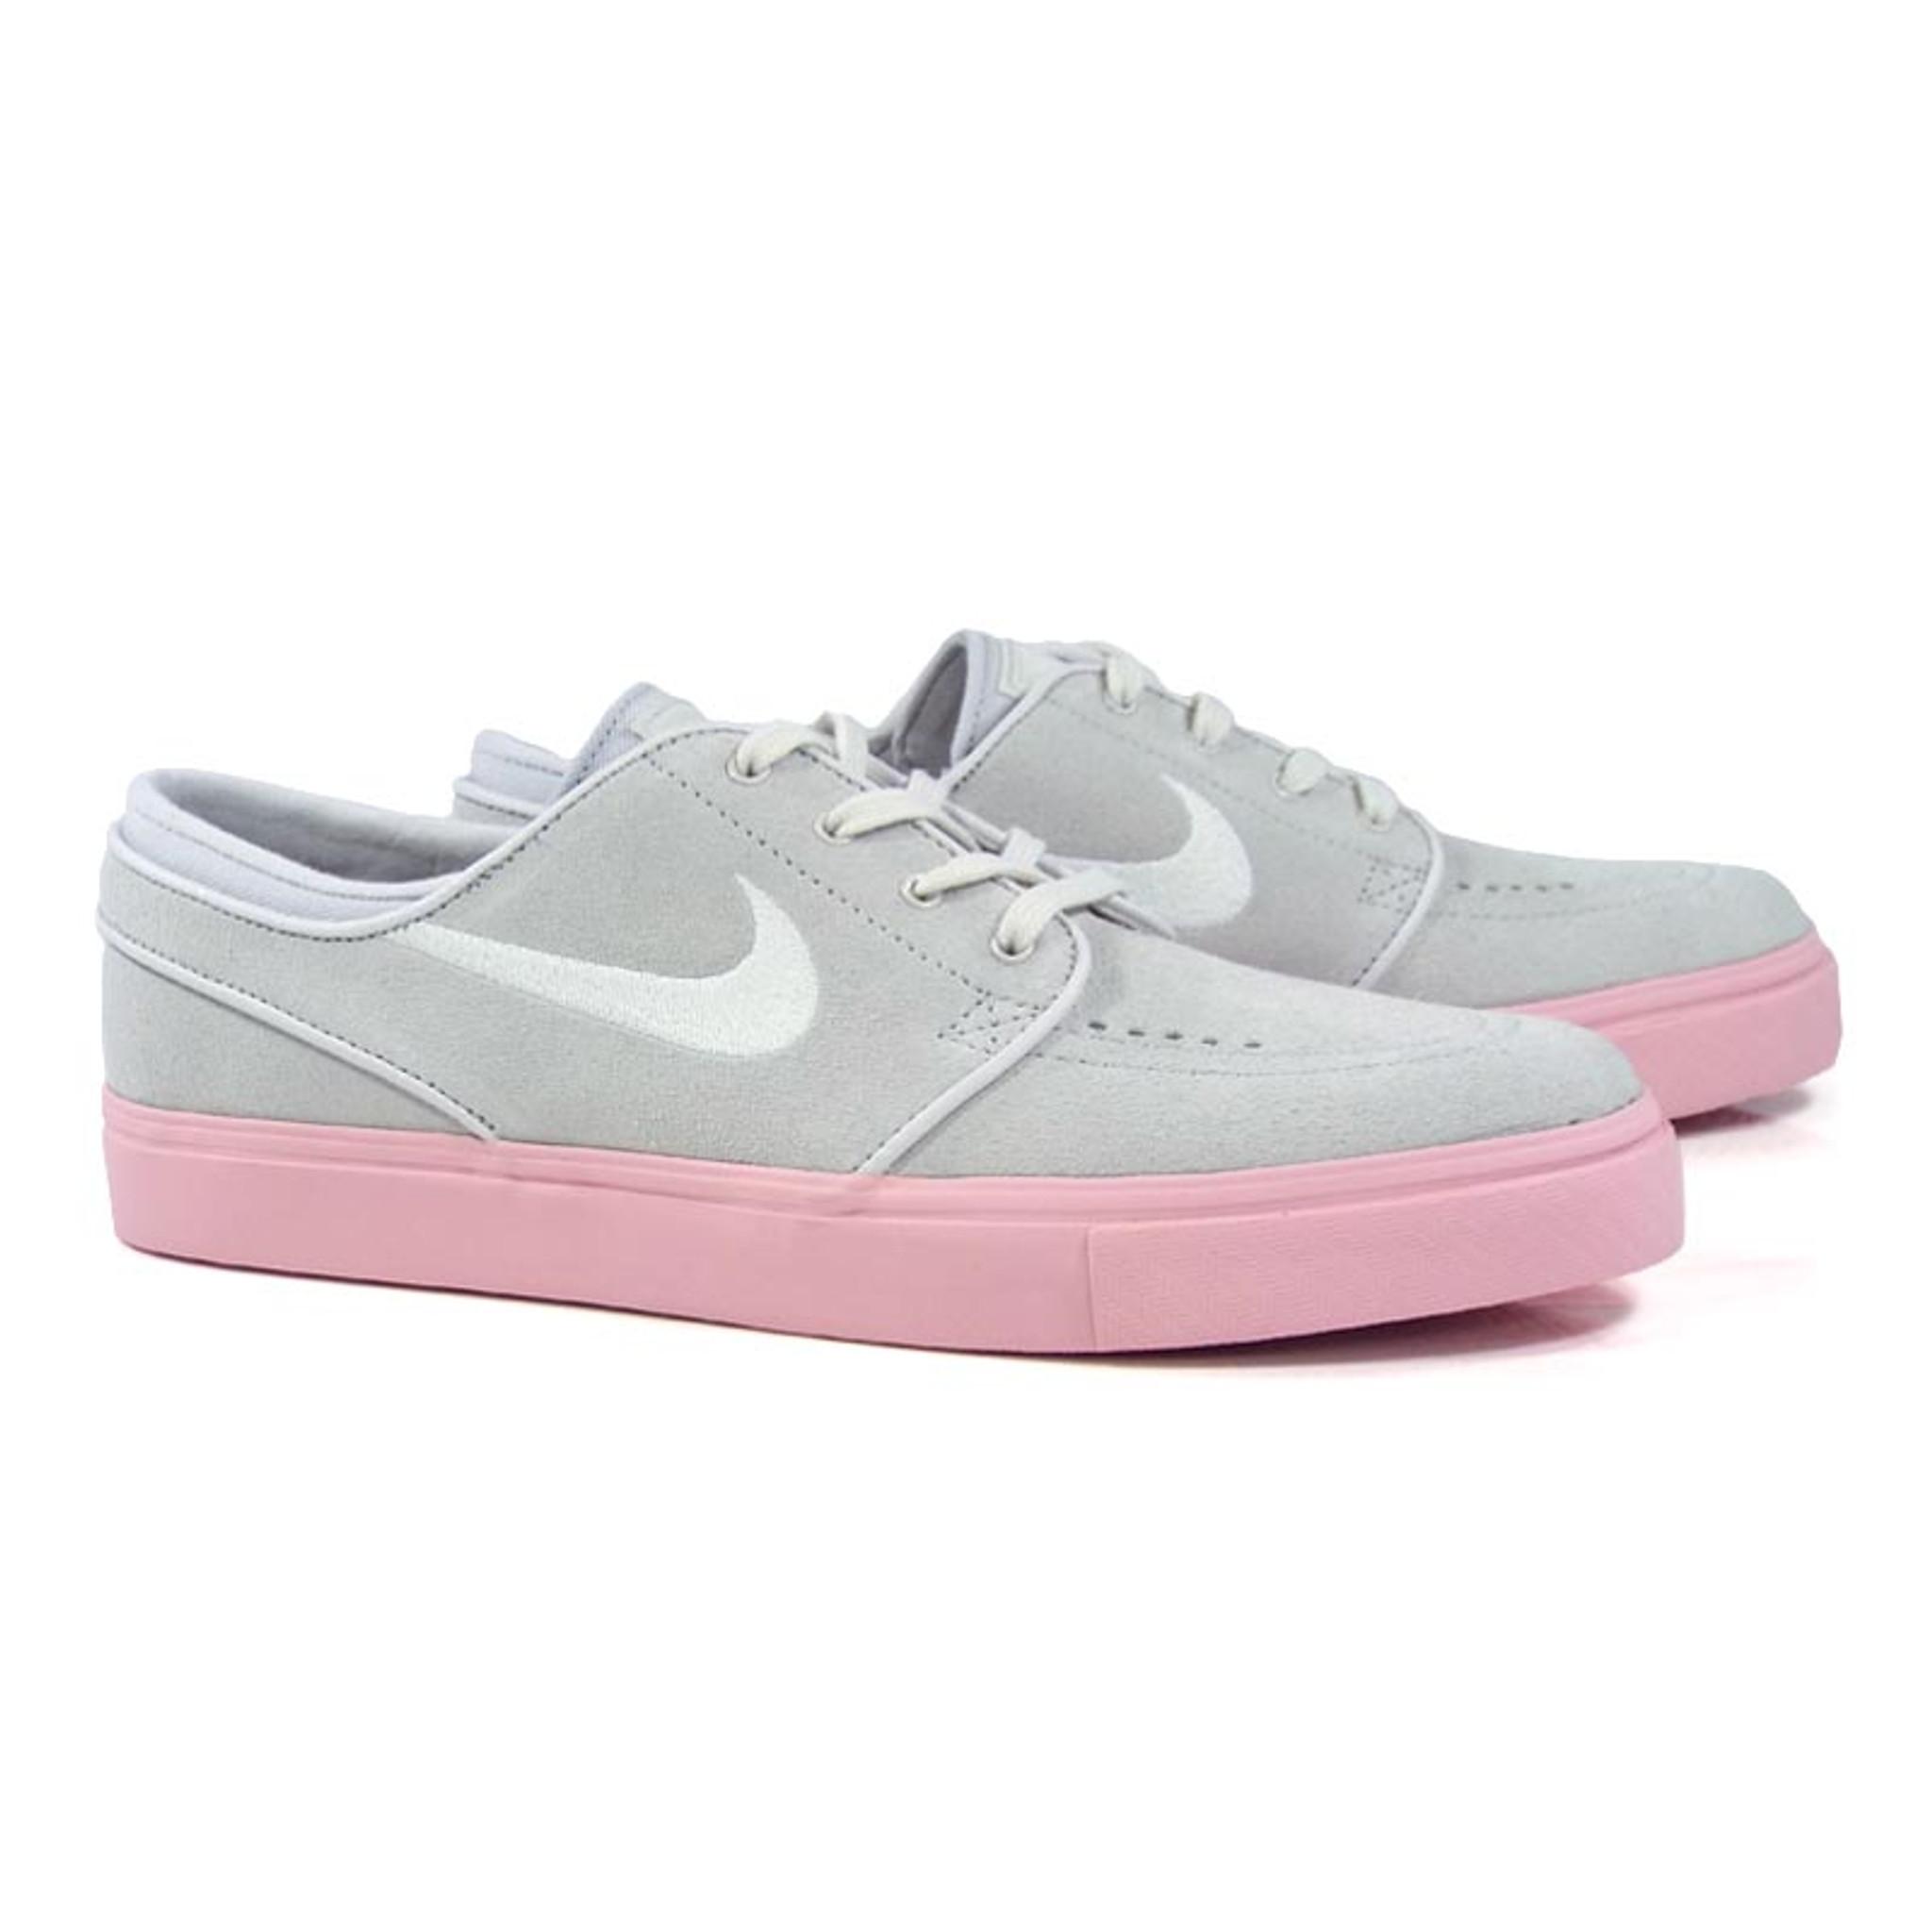 pierna Arcaico Cortar  Nike SB Zoom Stefan Janoski Shoes - Vast Grey/Phantom-Bubblegum-Bubblegum -  Detroit City Skateboards Co.